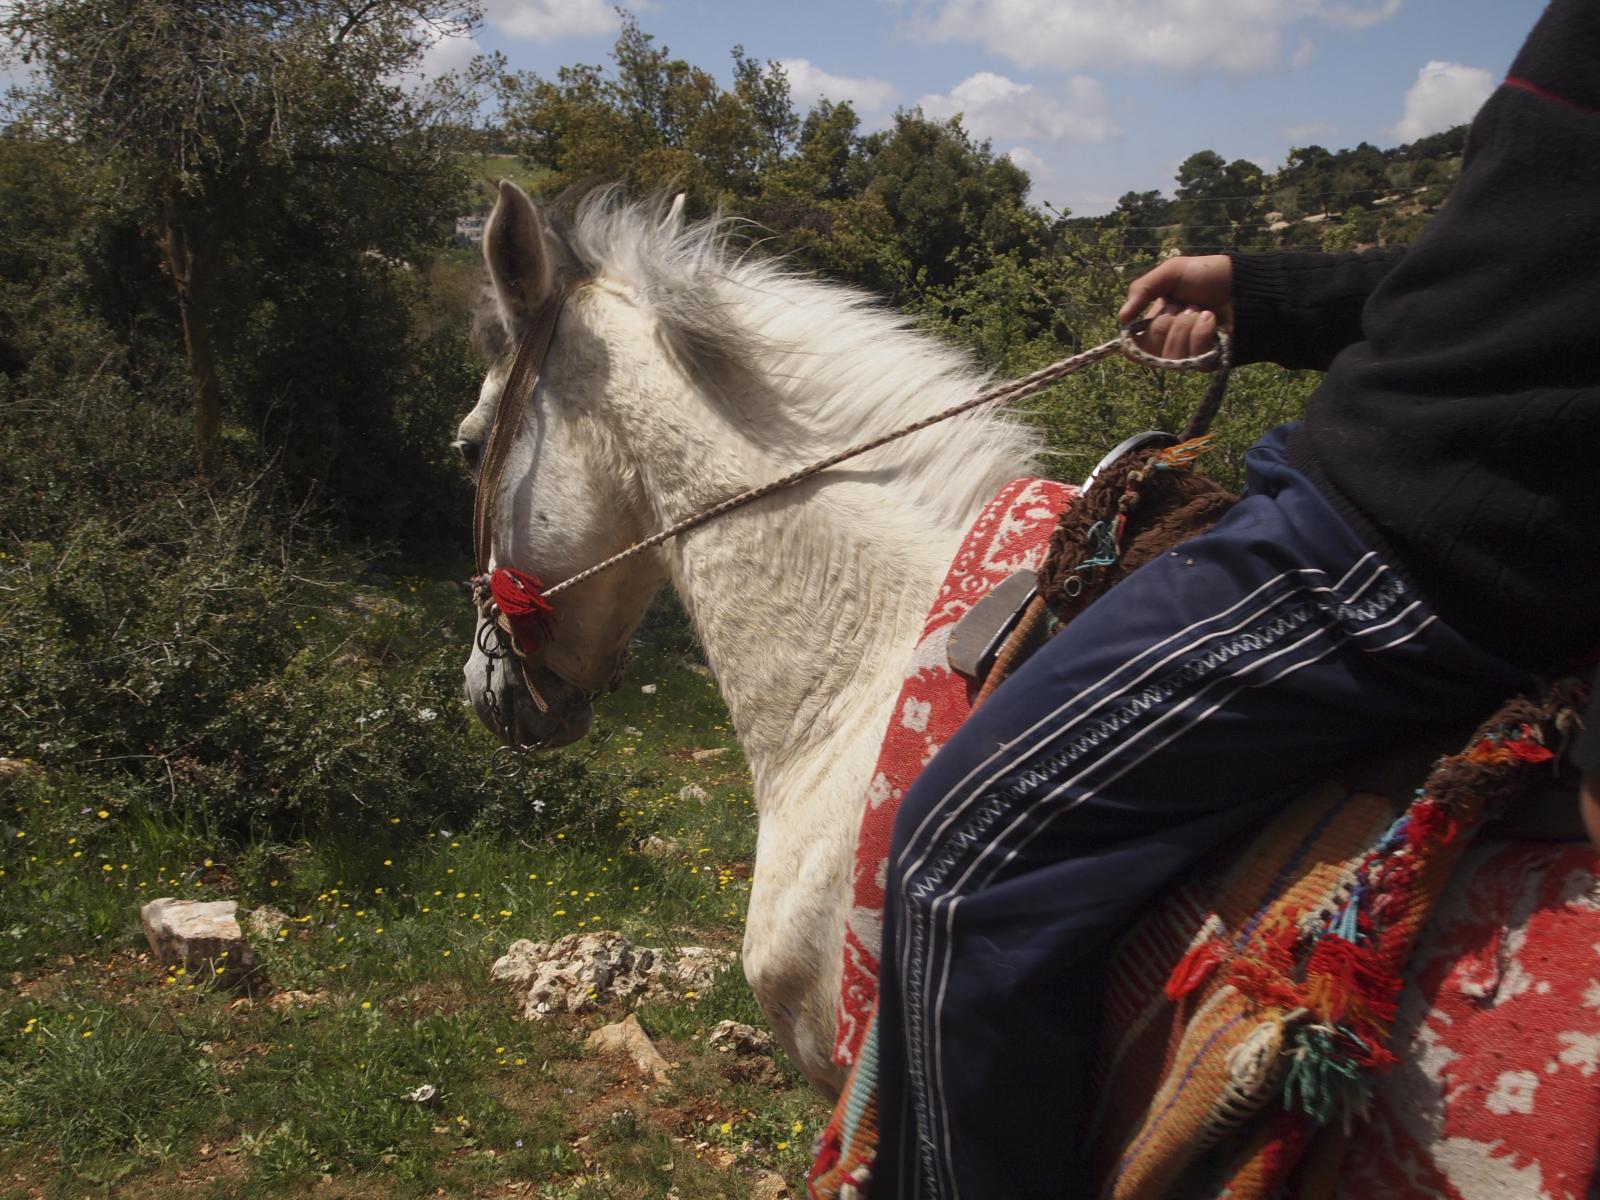 Jordan. Shefaa Hassan